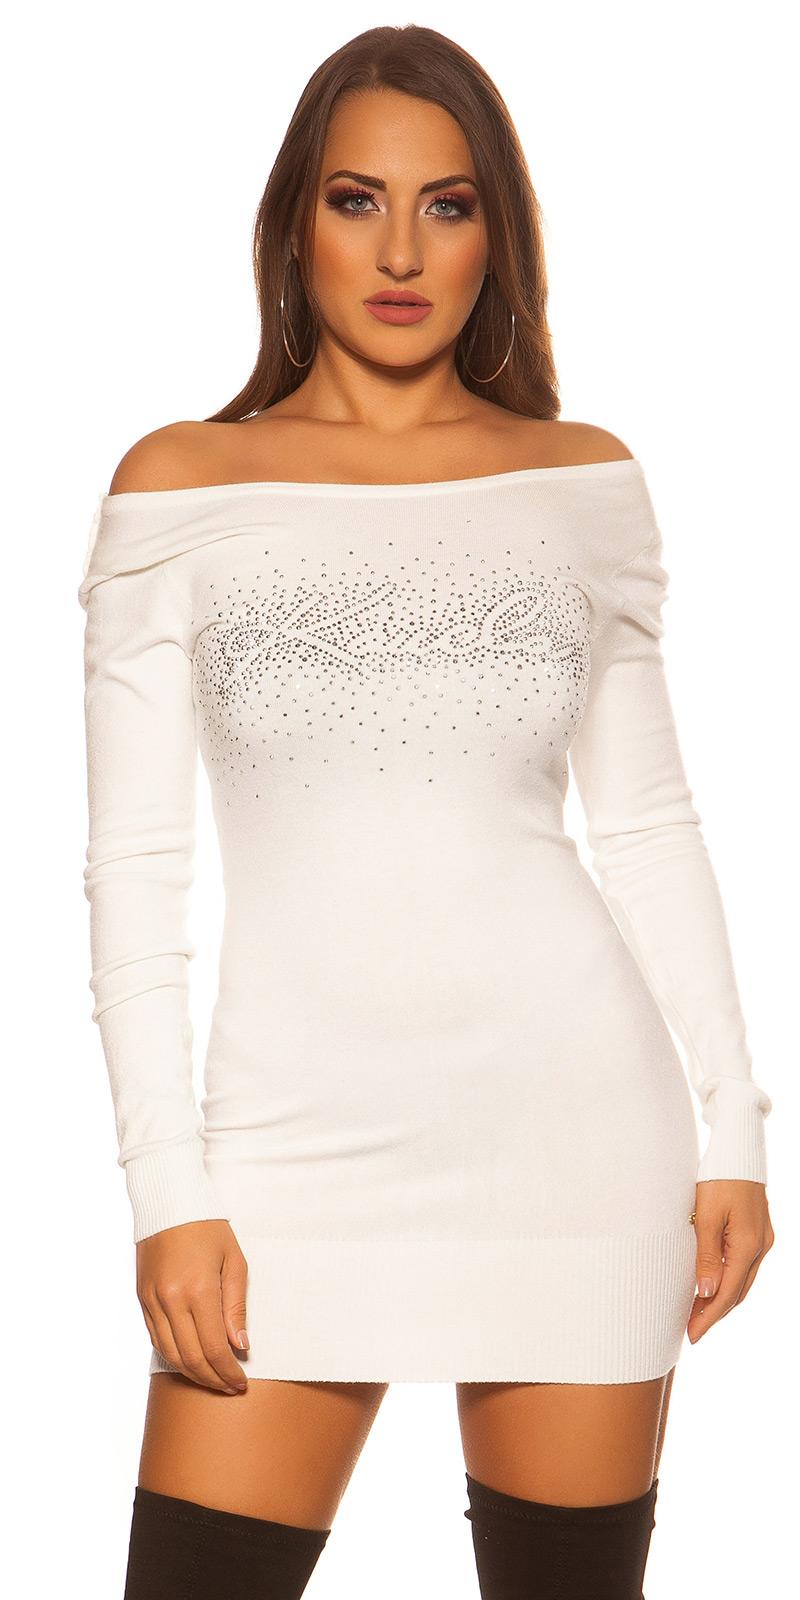 Šaty s dlouhým rukávem 0000ISF8266-N - white